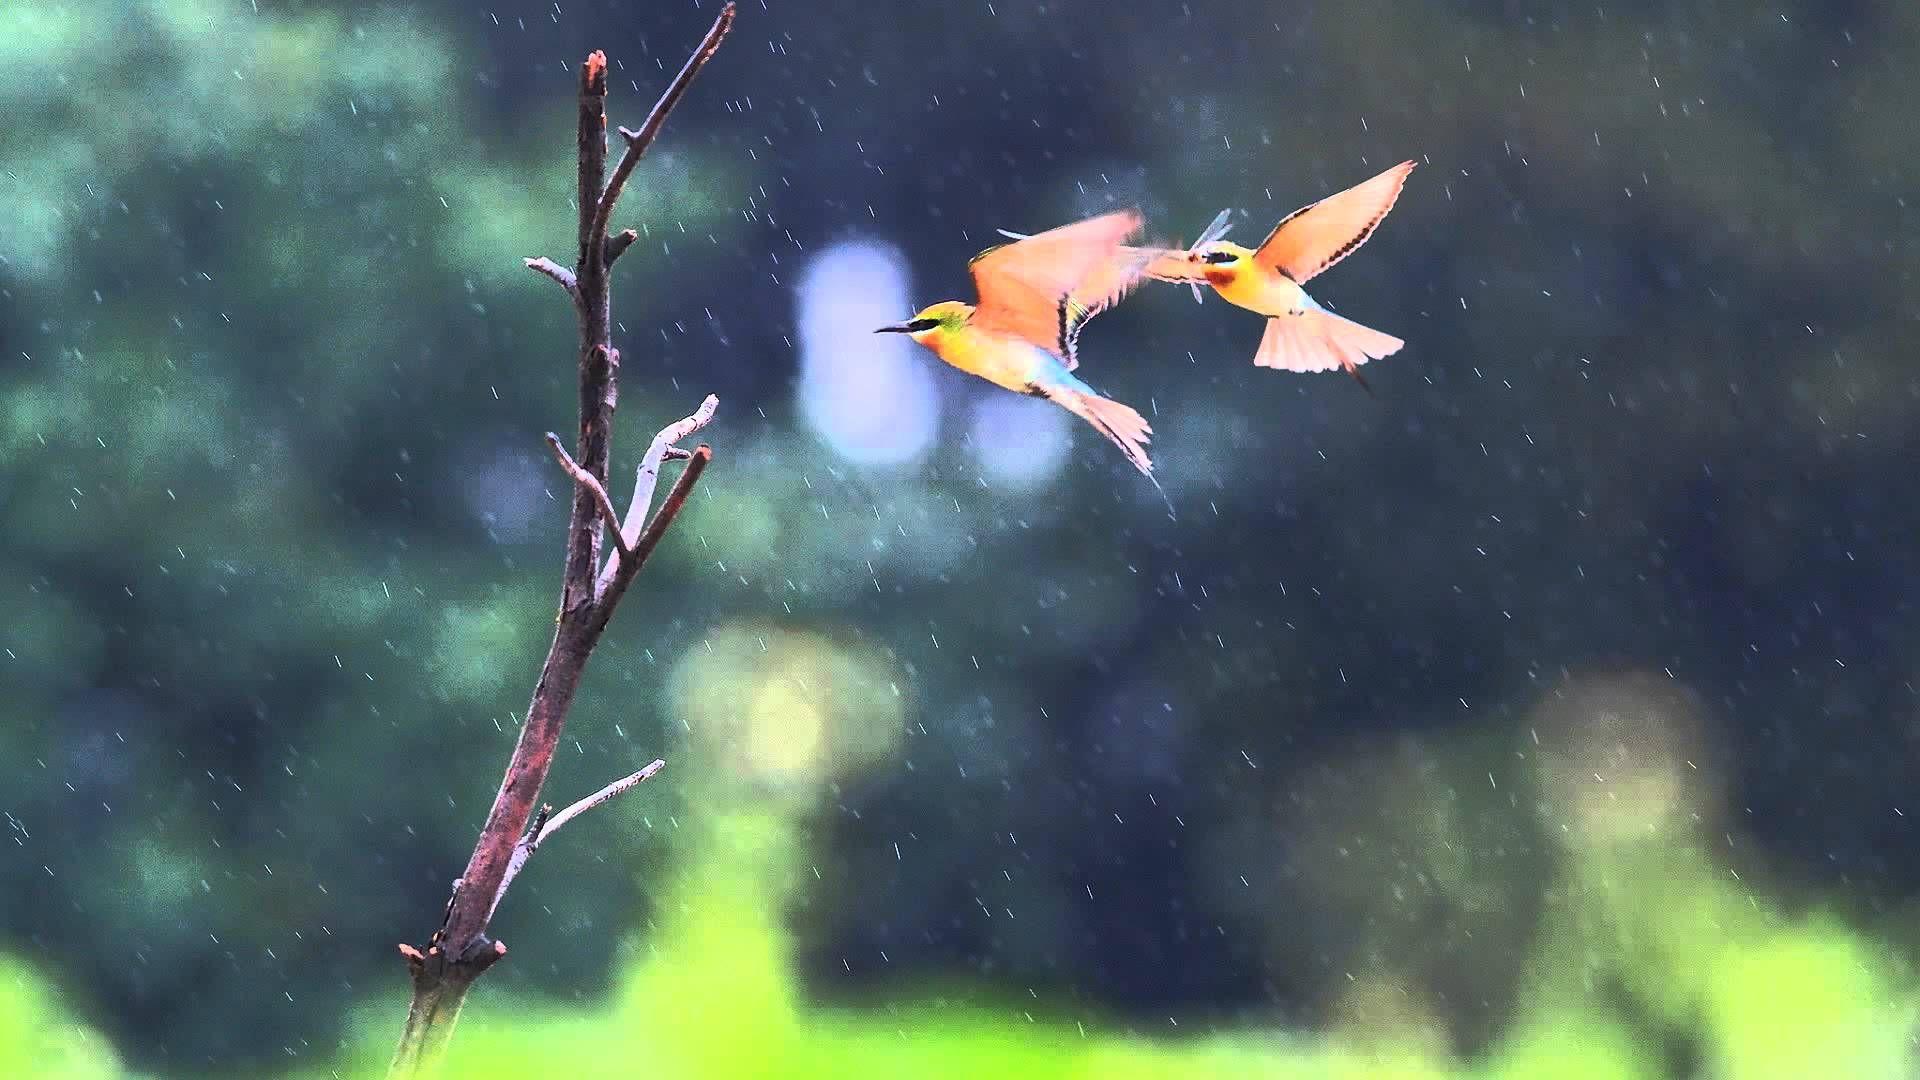 Relaxing Sounds Birds In The Rain Meditation Bowls Music Backgroun Animals Bird Wallpaper Big Animals